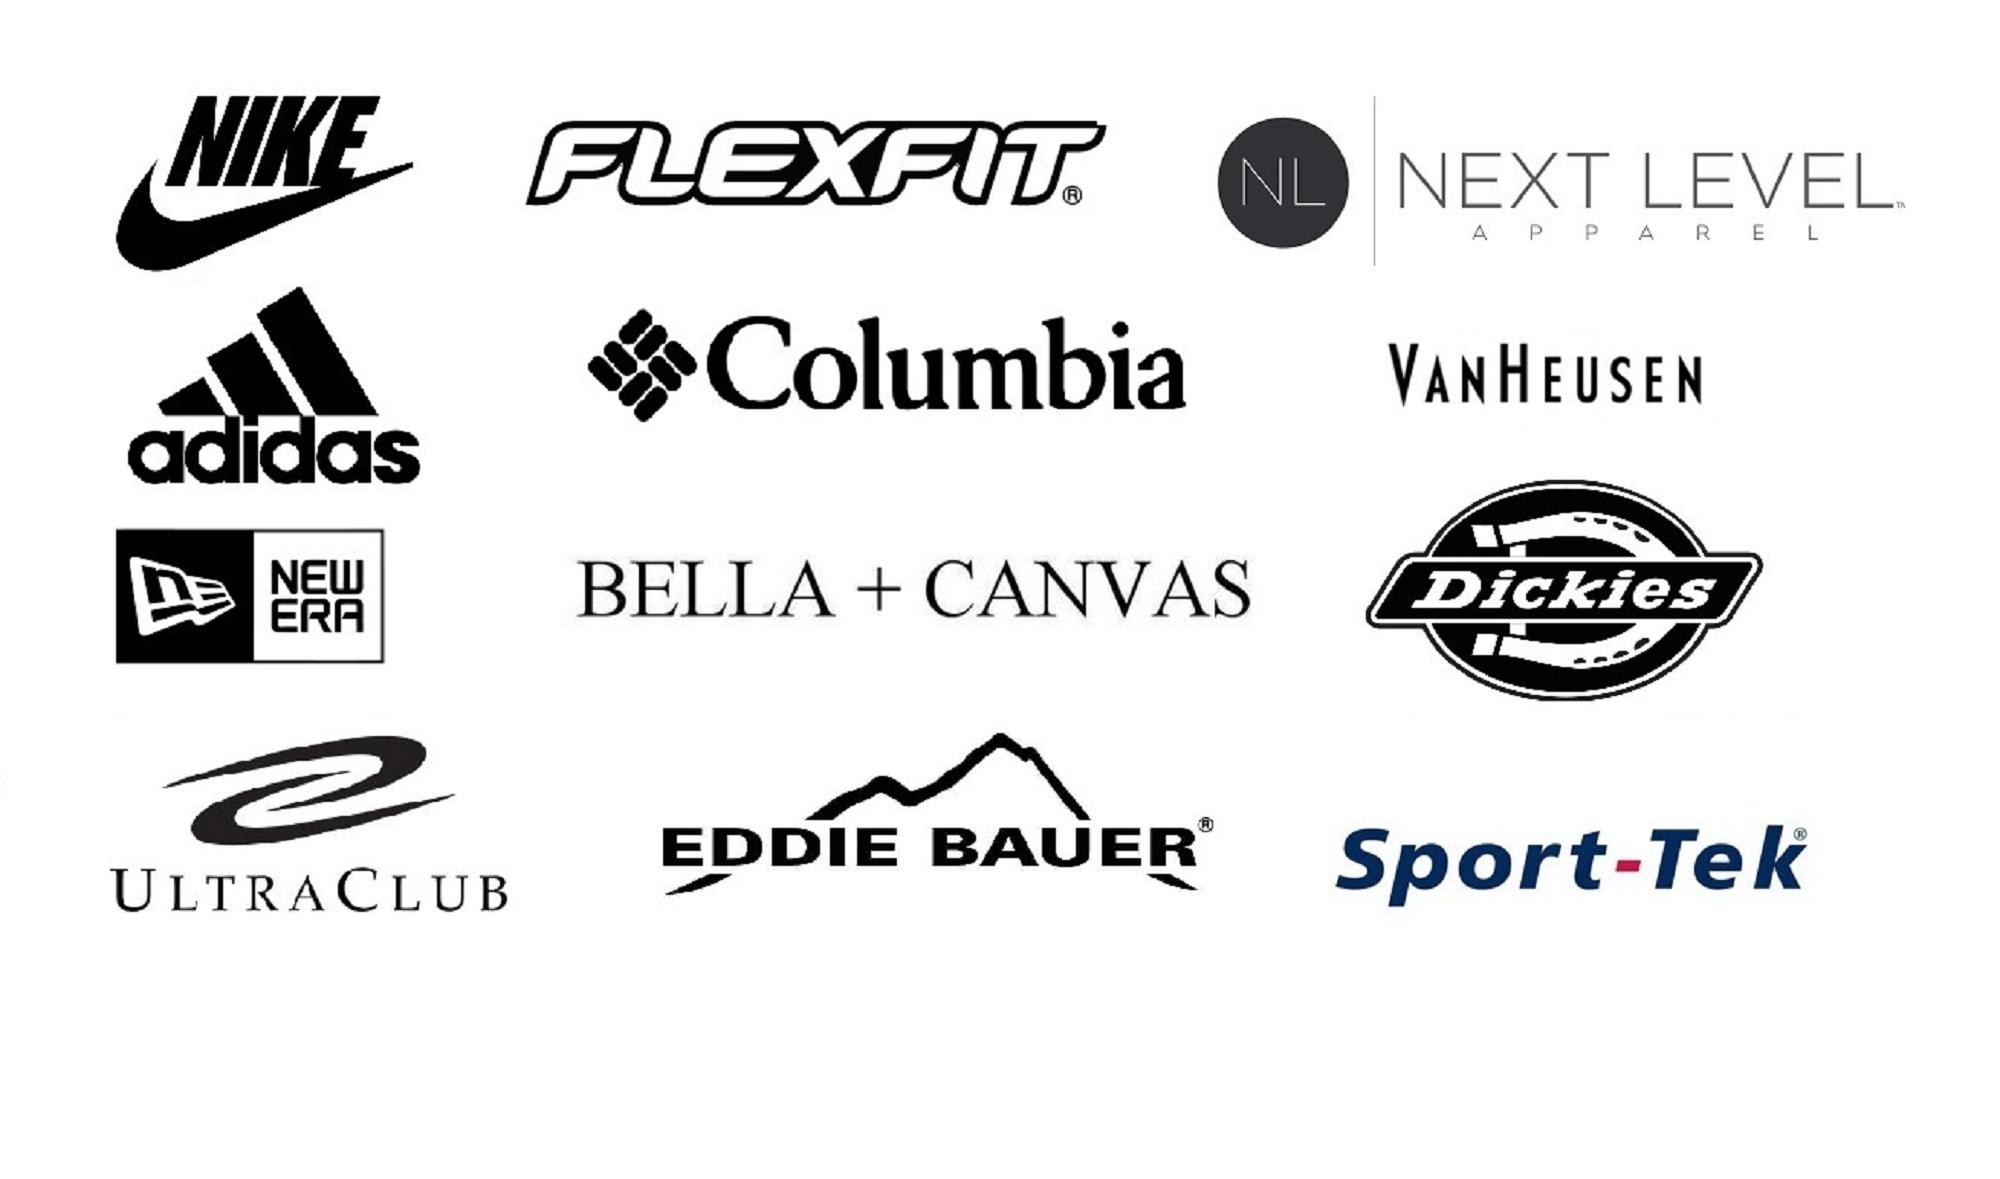 Nike, Adidas, Columbia, Flexfit, New Era, Eddie Bauer